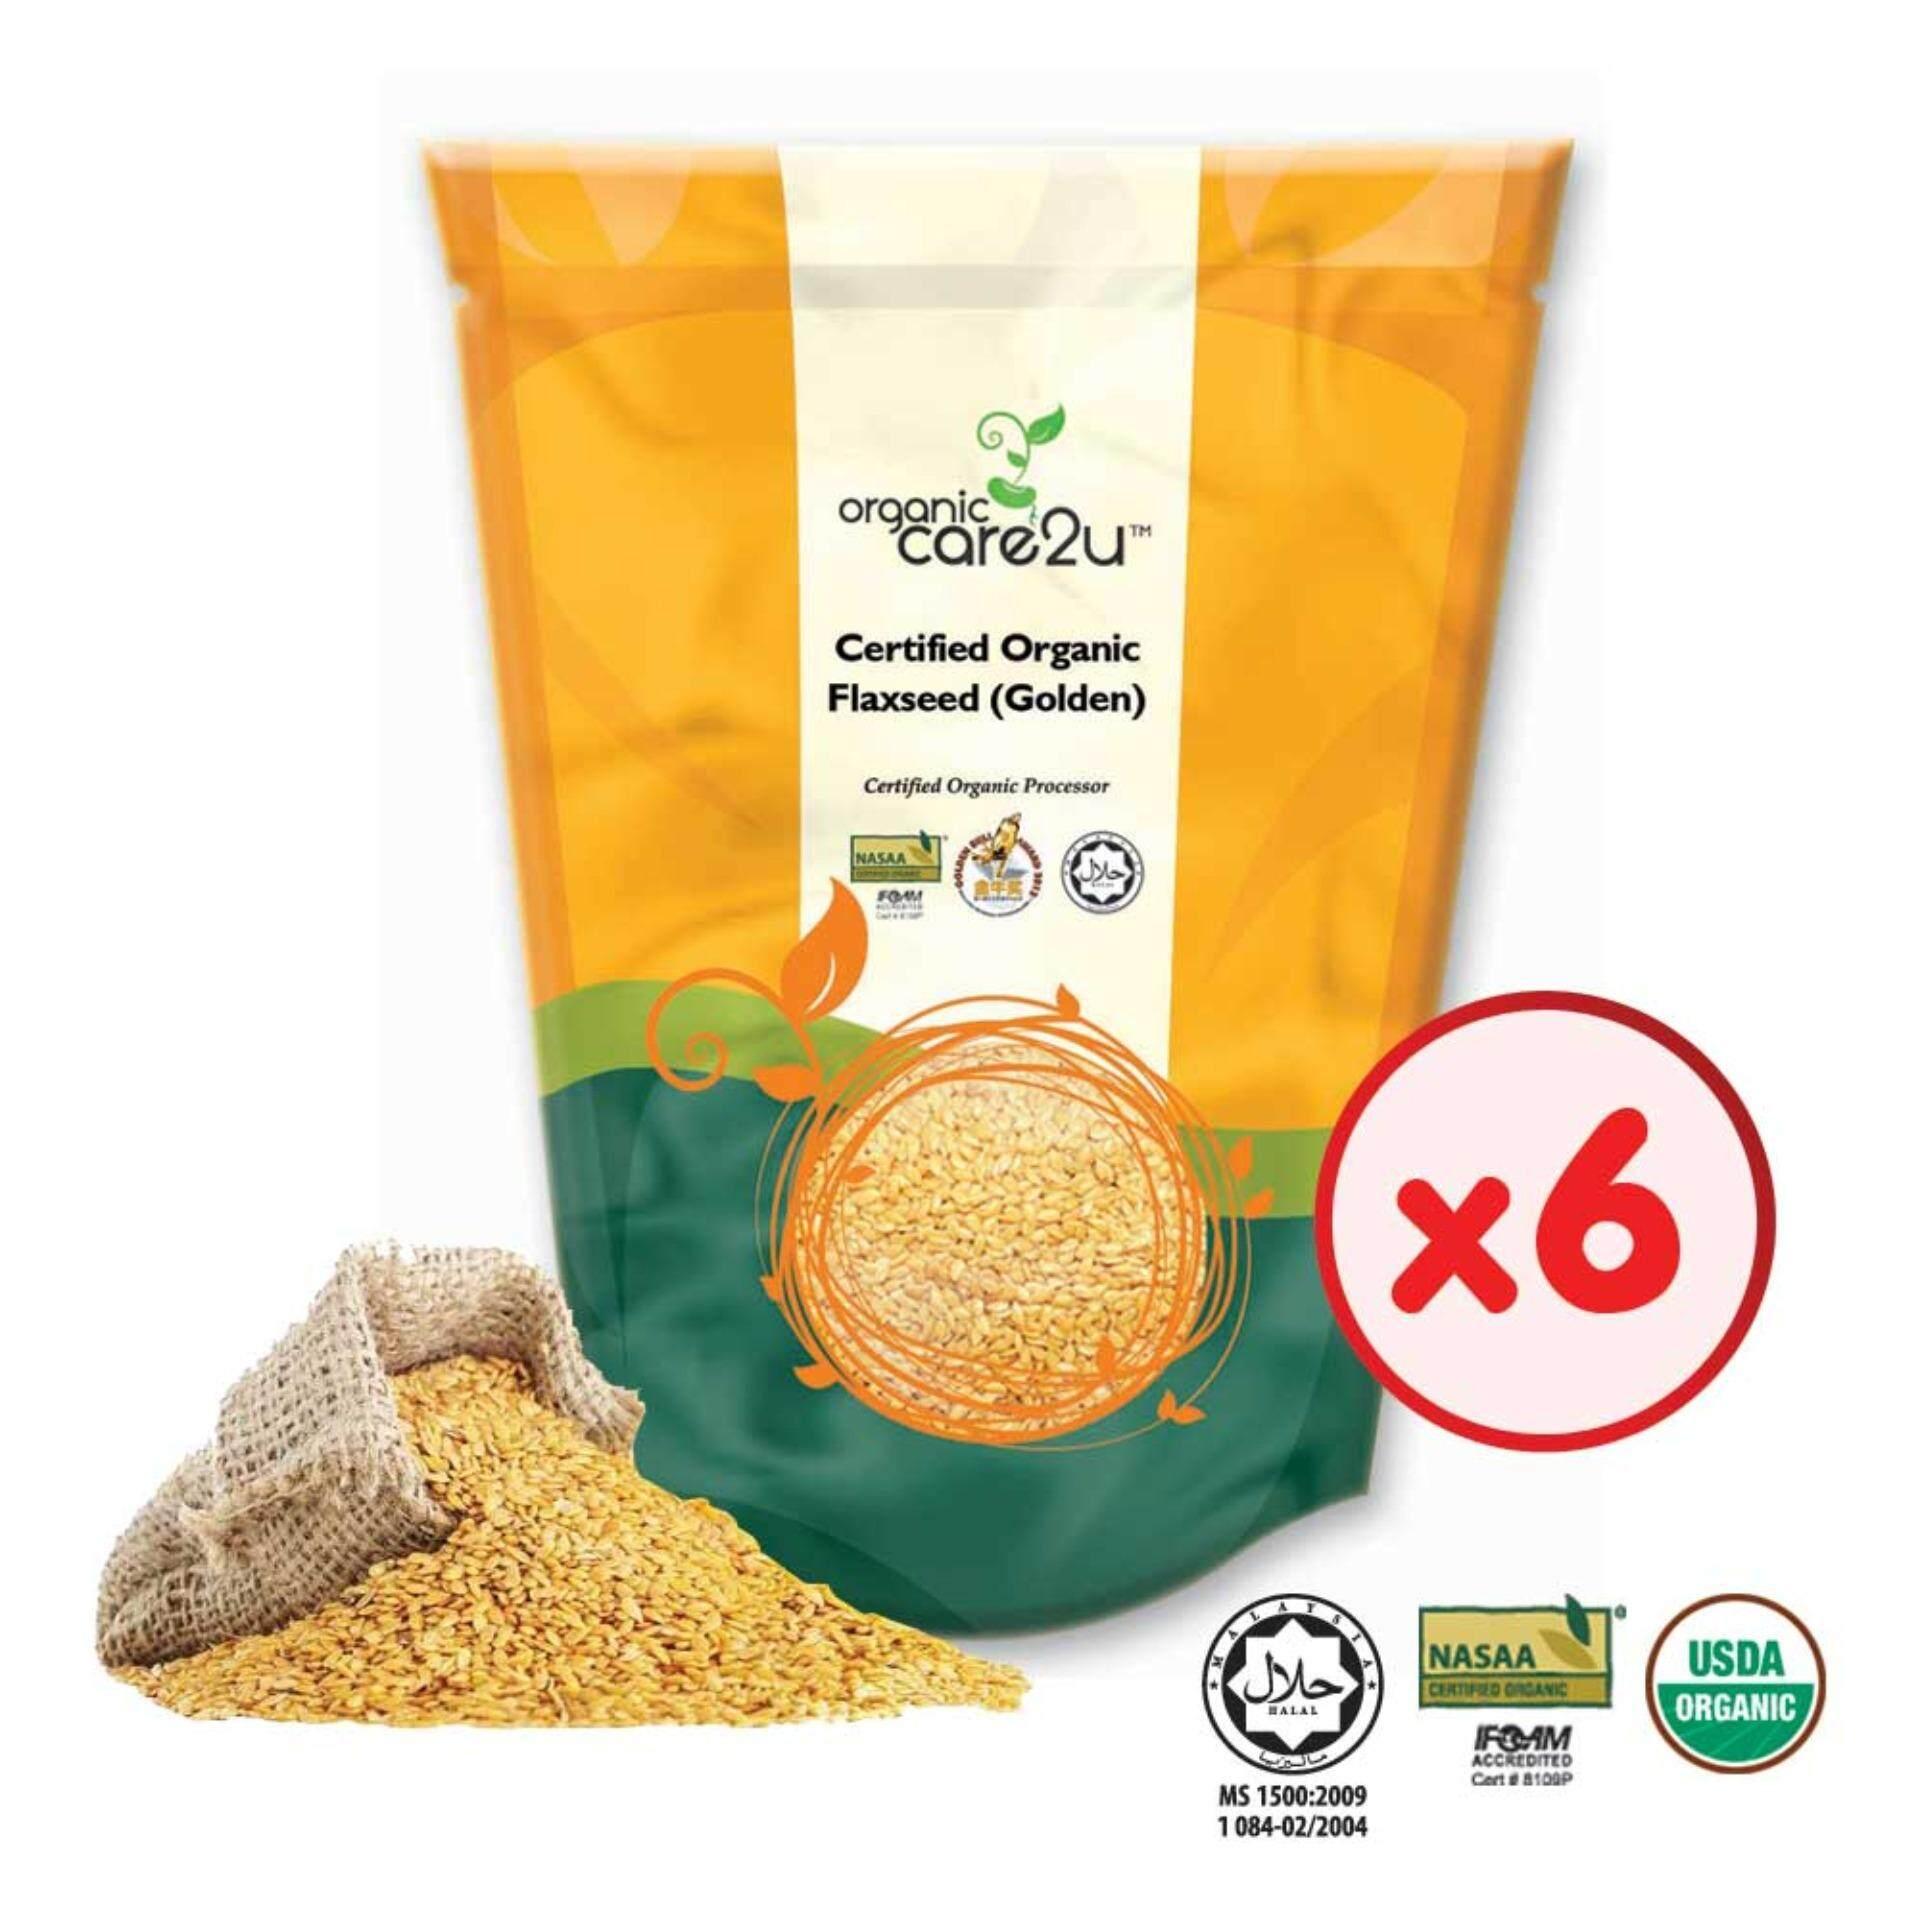 Organic Care2u Organic Flax Seed (Golden) (200g x 6 Packs)